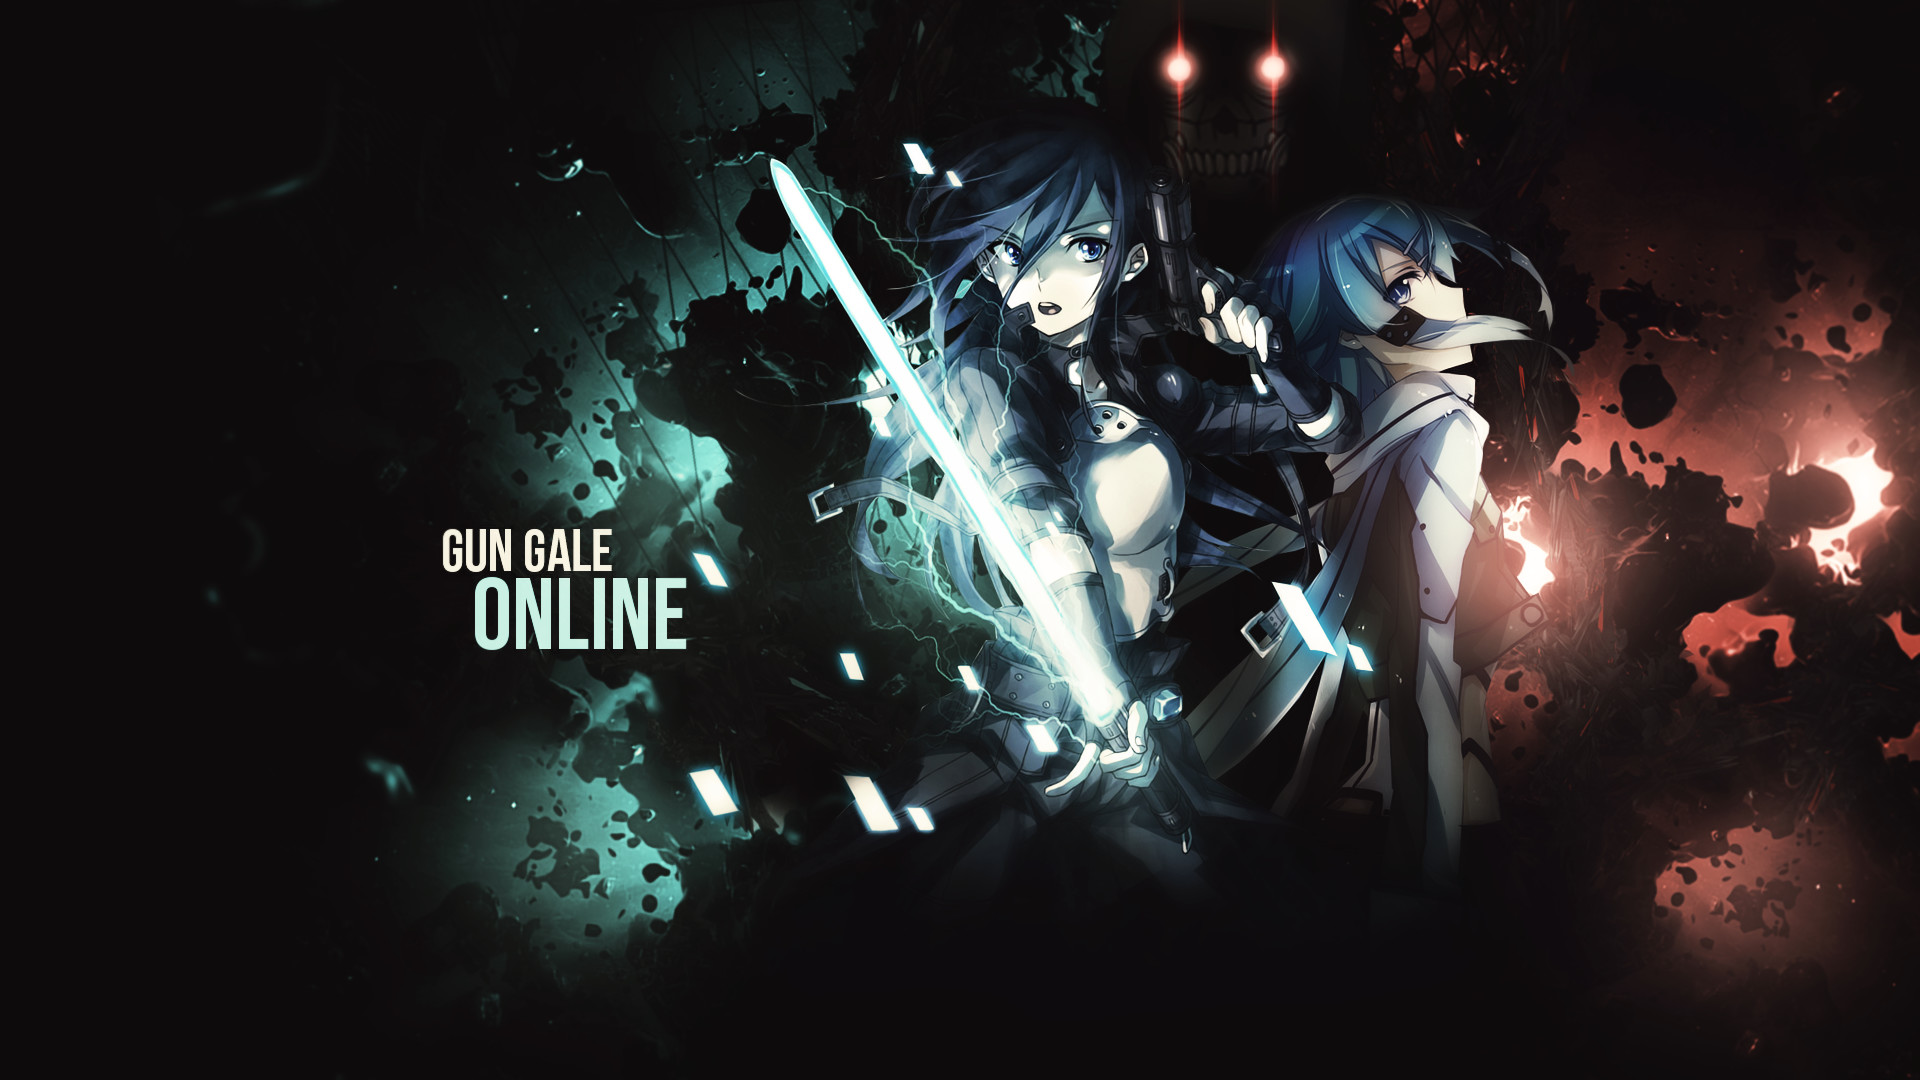 Kirito Sword Art Online · HD Wallpaper | Background ID:632568